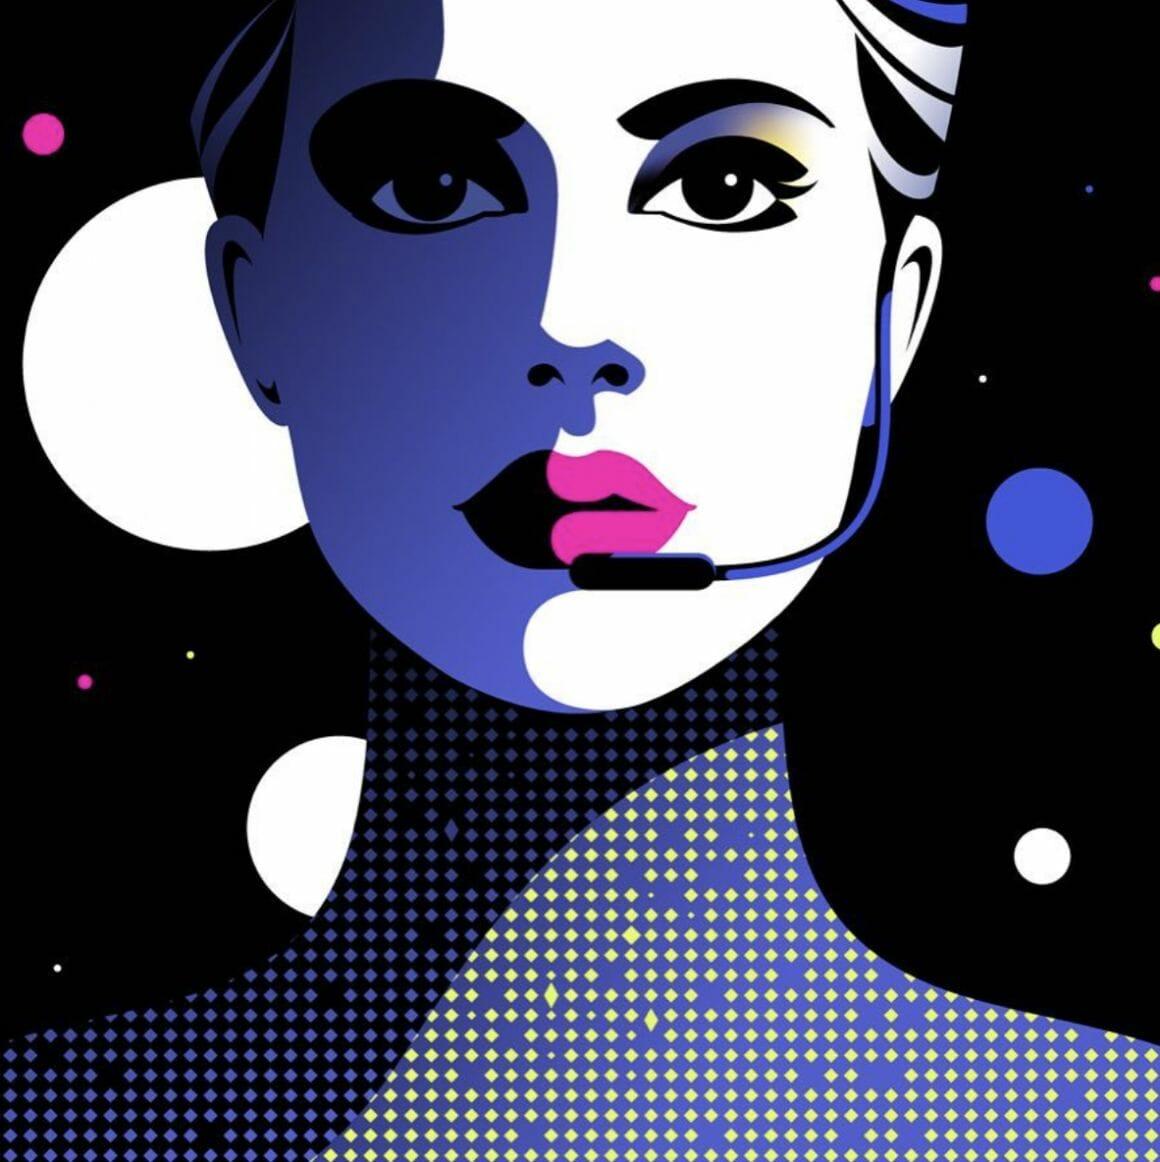 Vox Lux, illustration de Malika Favre